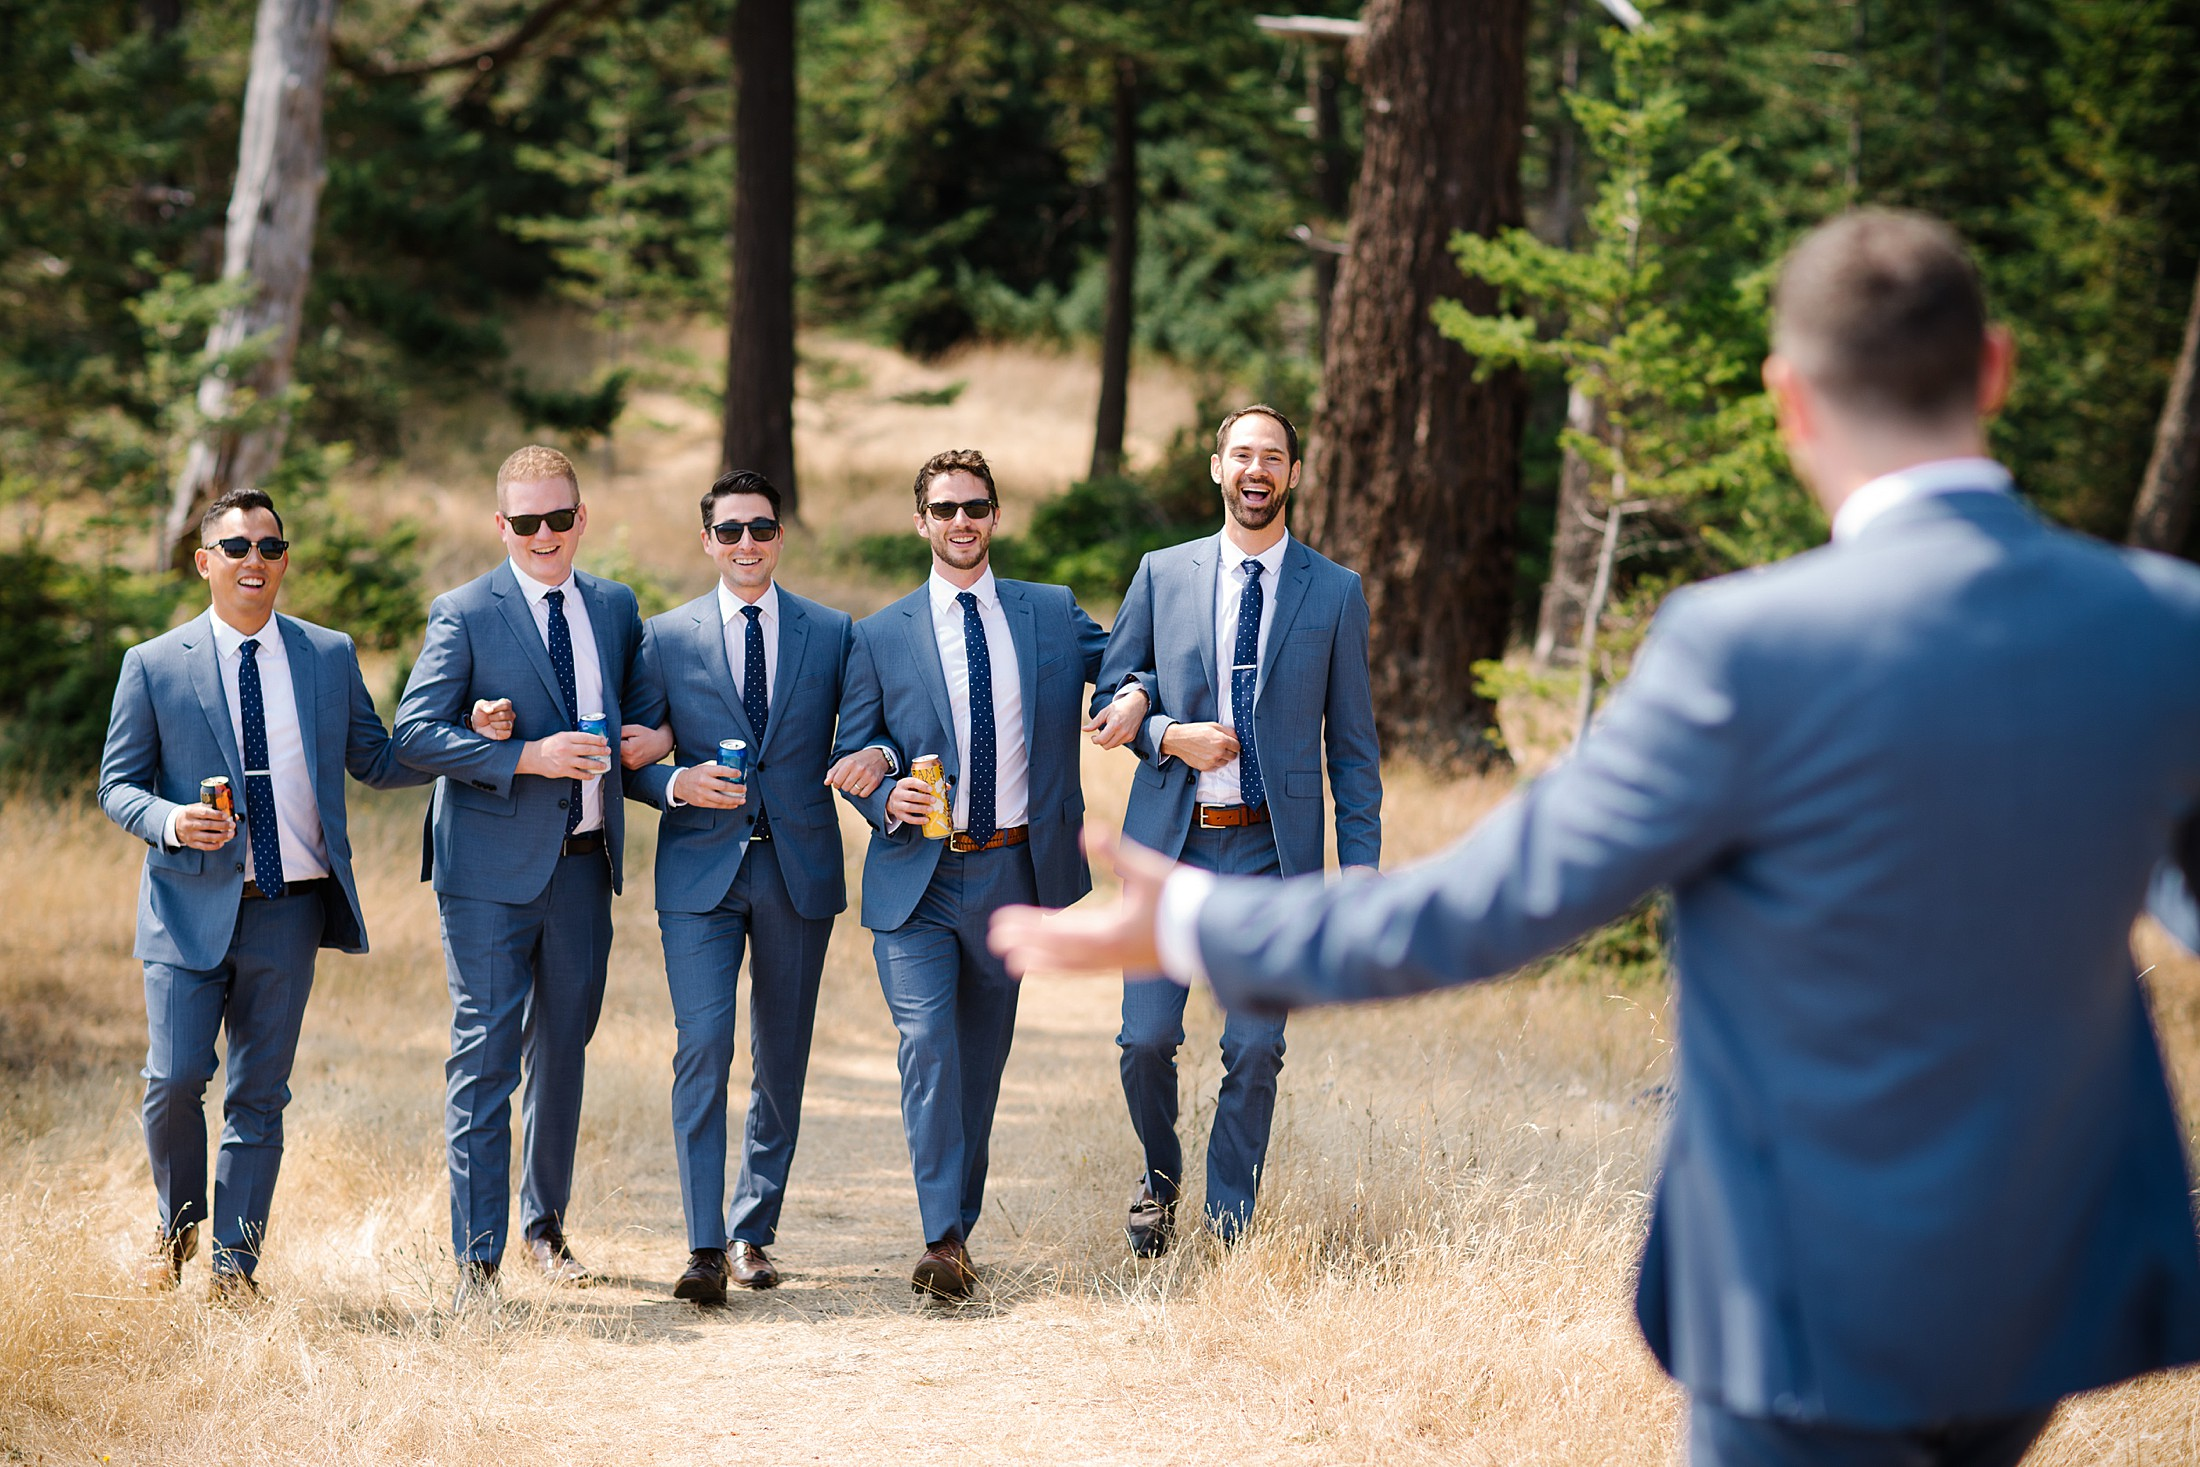 July28.ReenaGord2614_Note Photography Documentary Photographer Wedding Photos Vancouver B.C. Best of 2018 2019 2020 Vancouver Island Okanagan Banff Edmonton Victoria.jpg